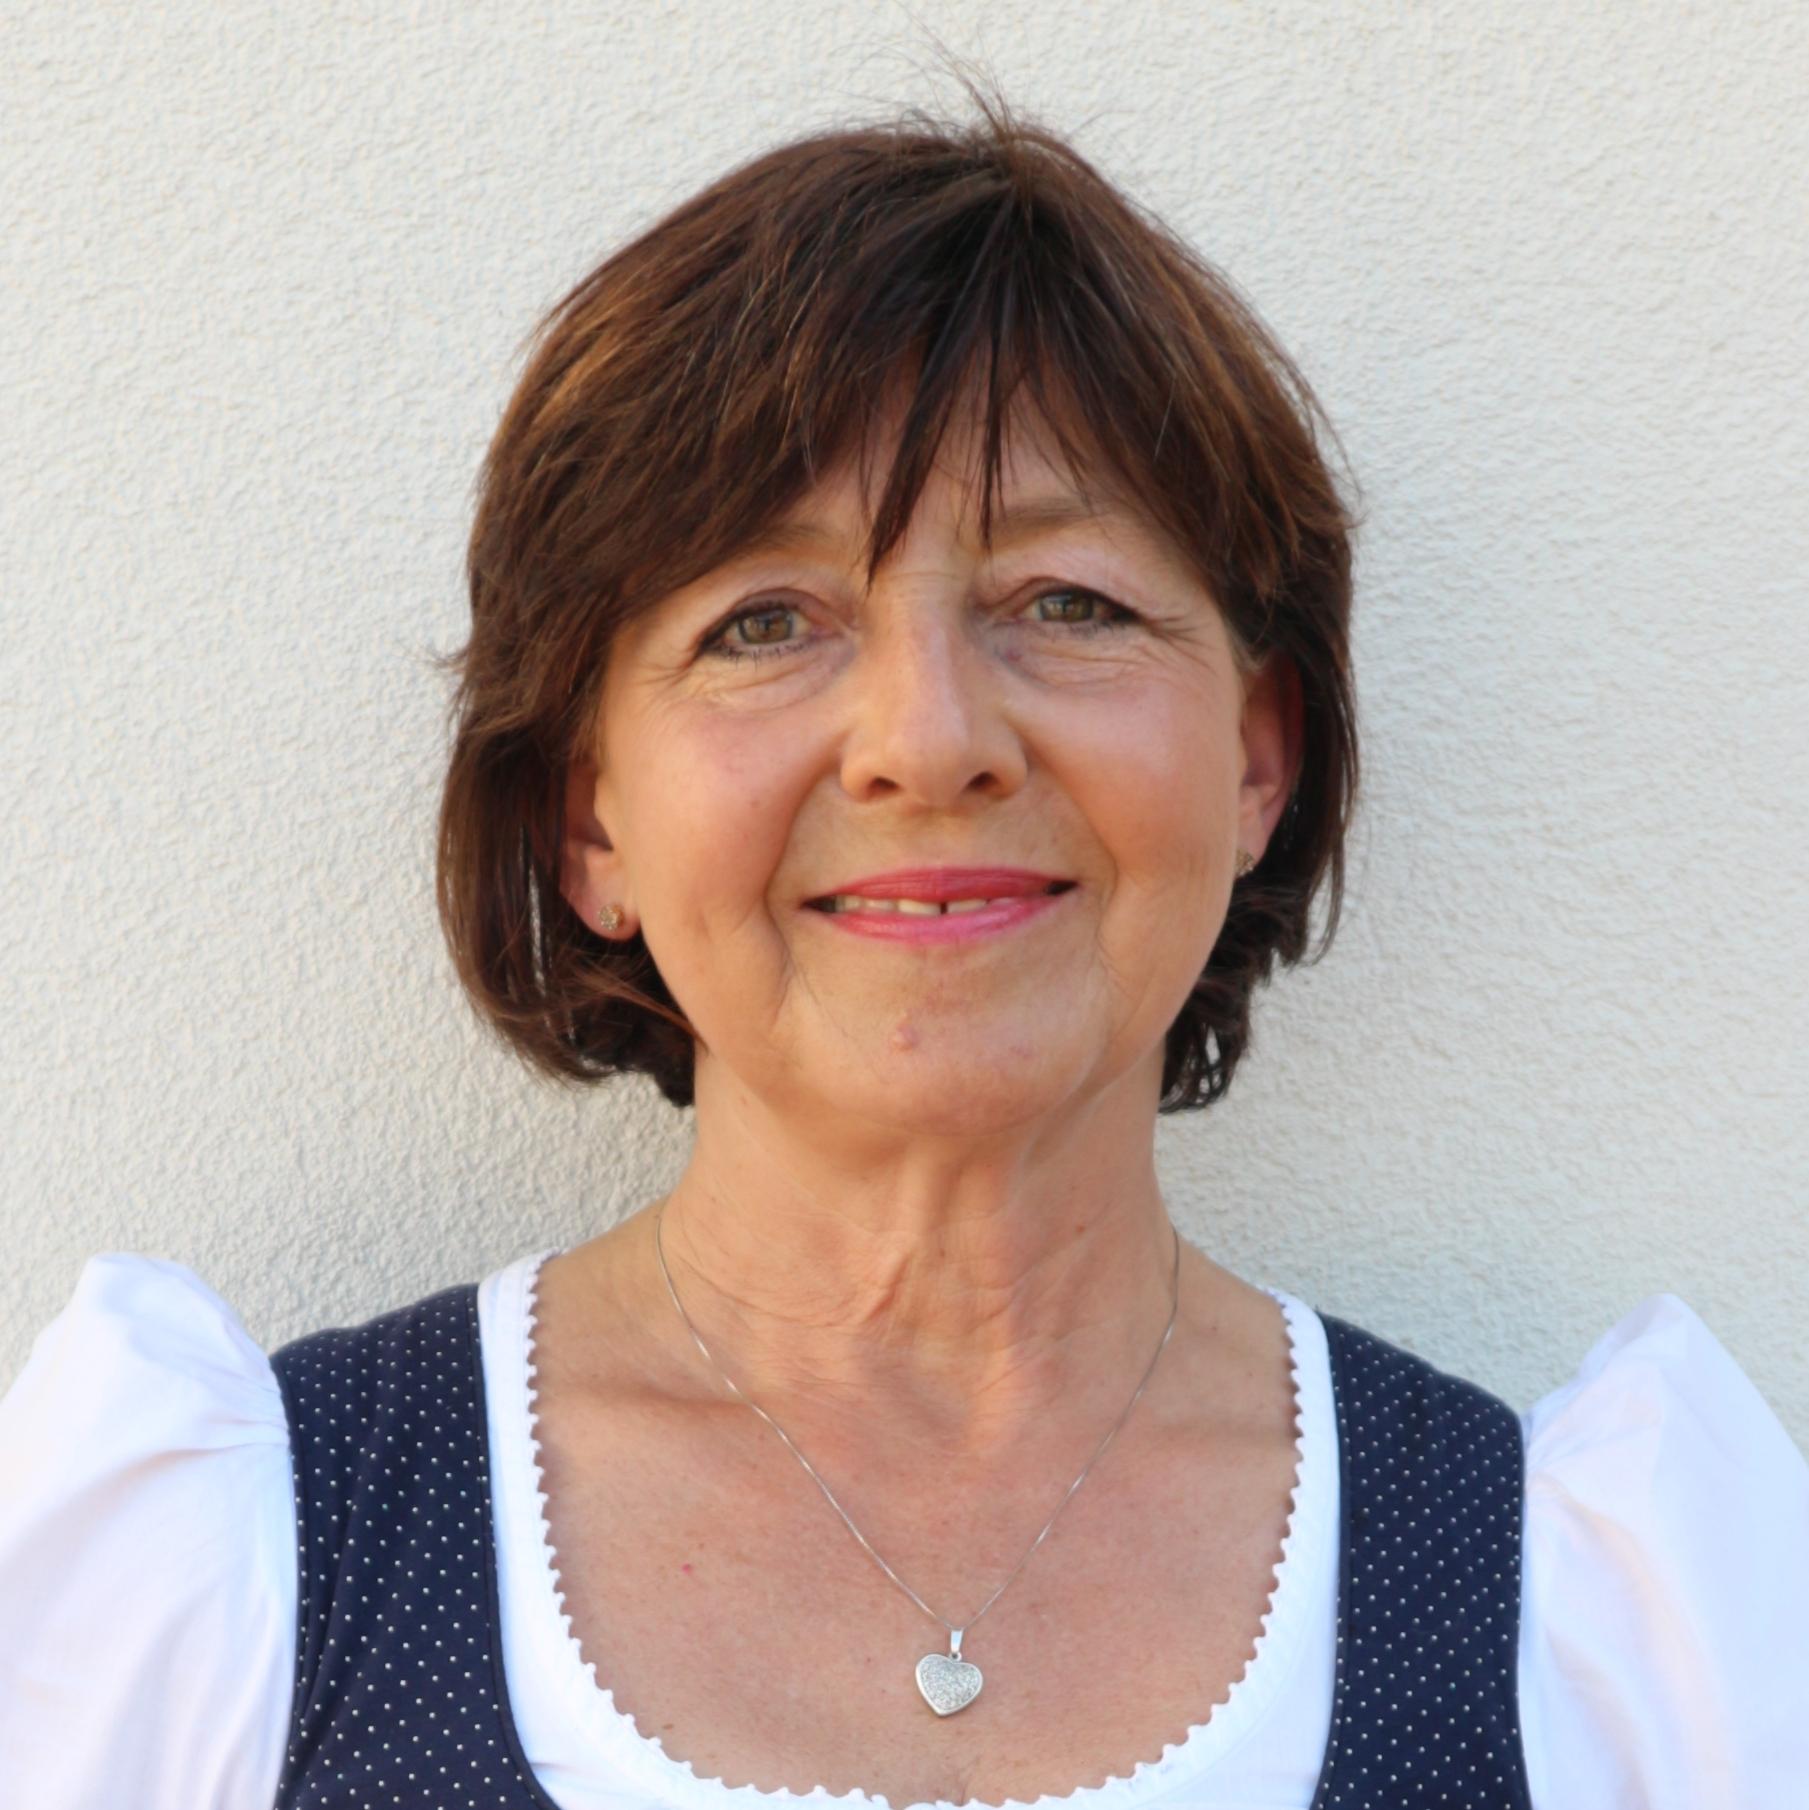 Gertrud Seebacher